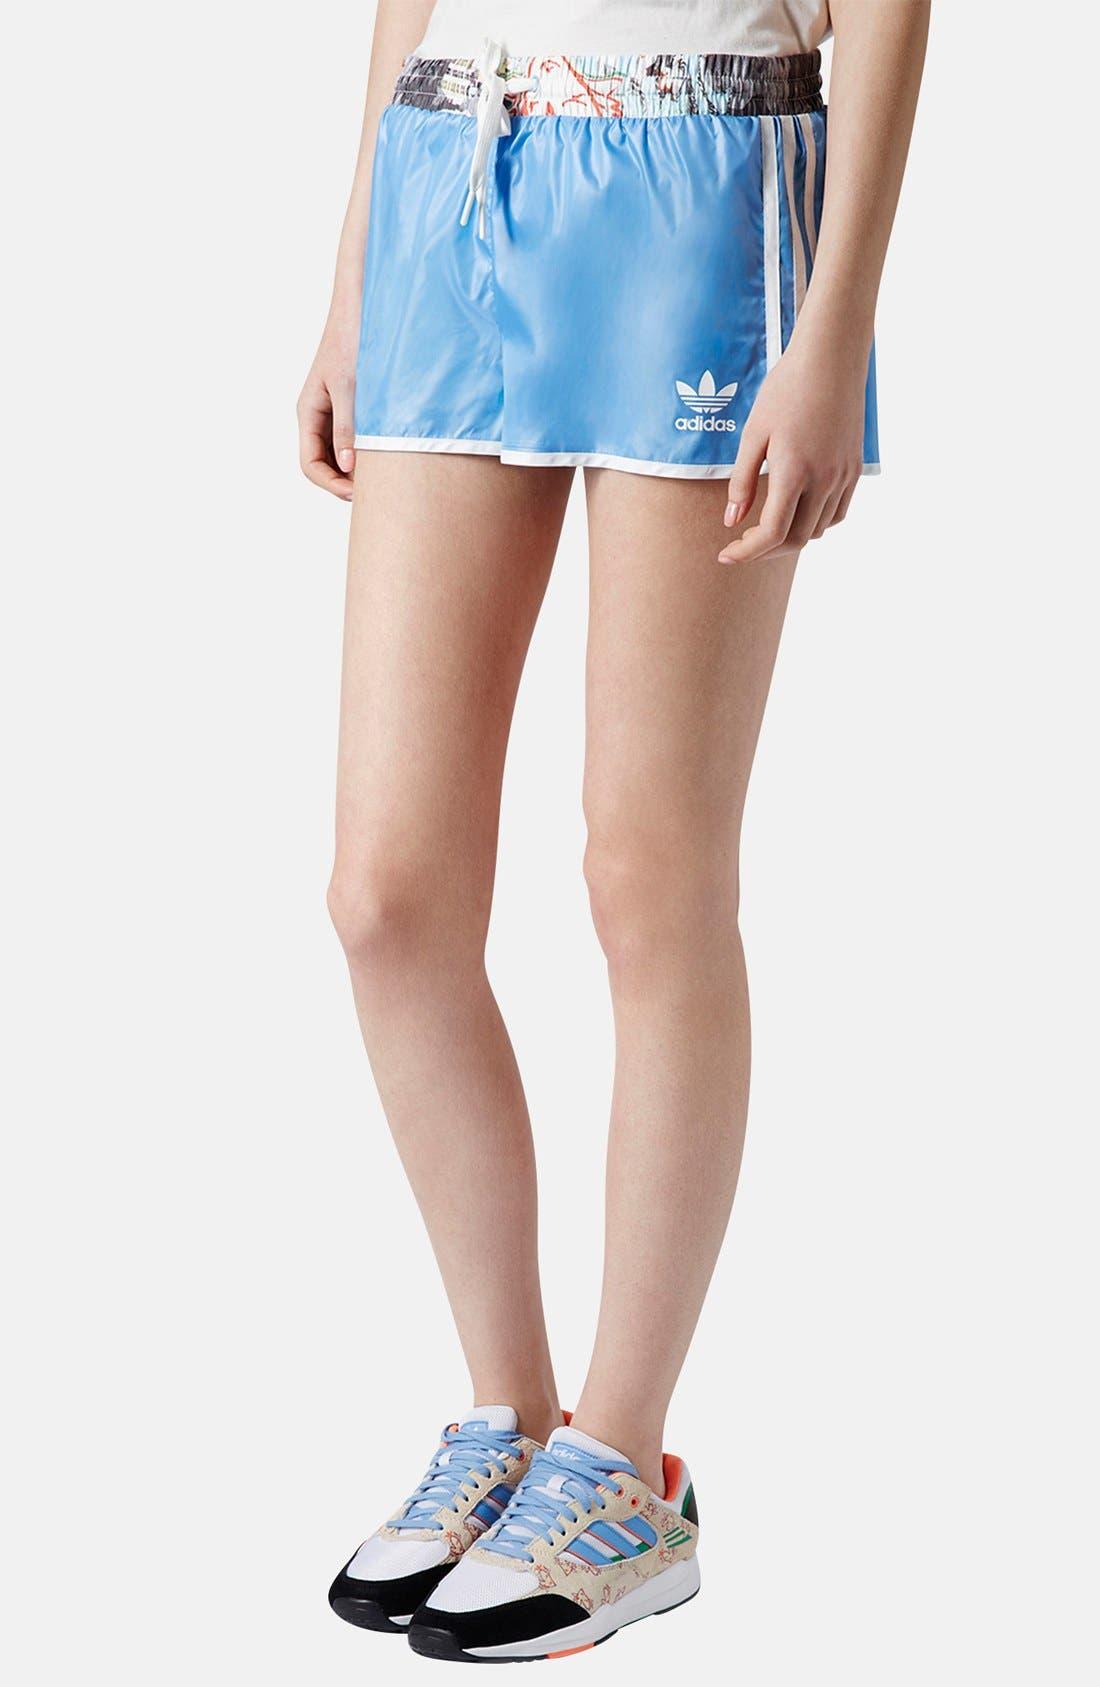 Alternate Image 1 Selected - Topshop x adidas Originals Blue Shorts